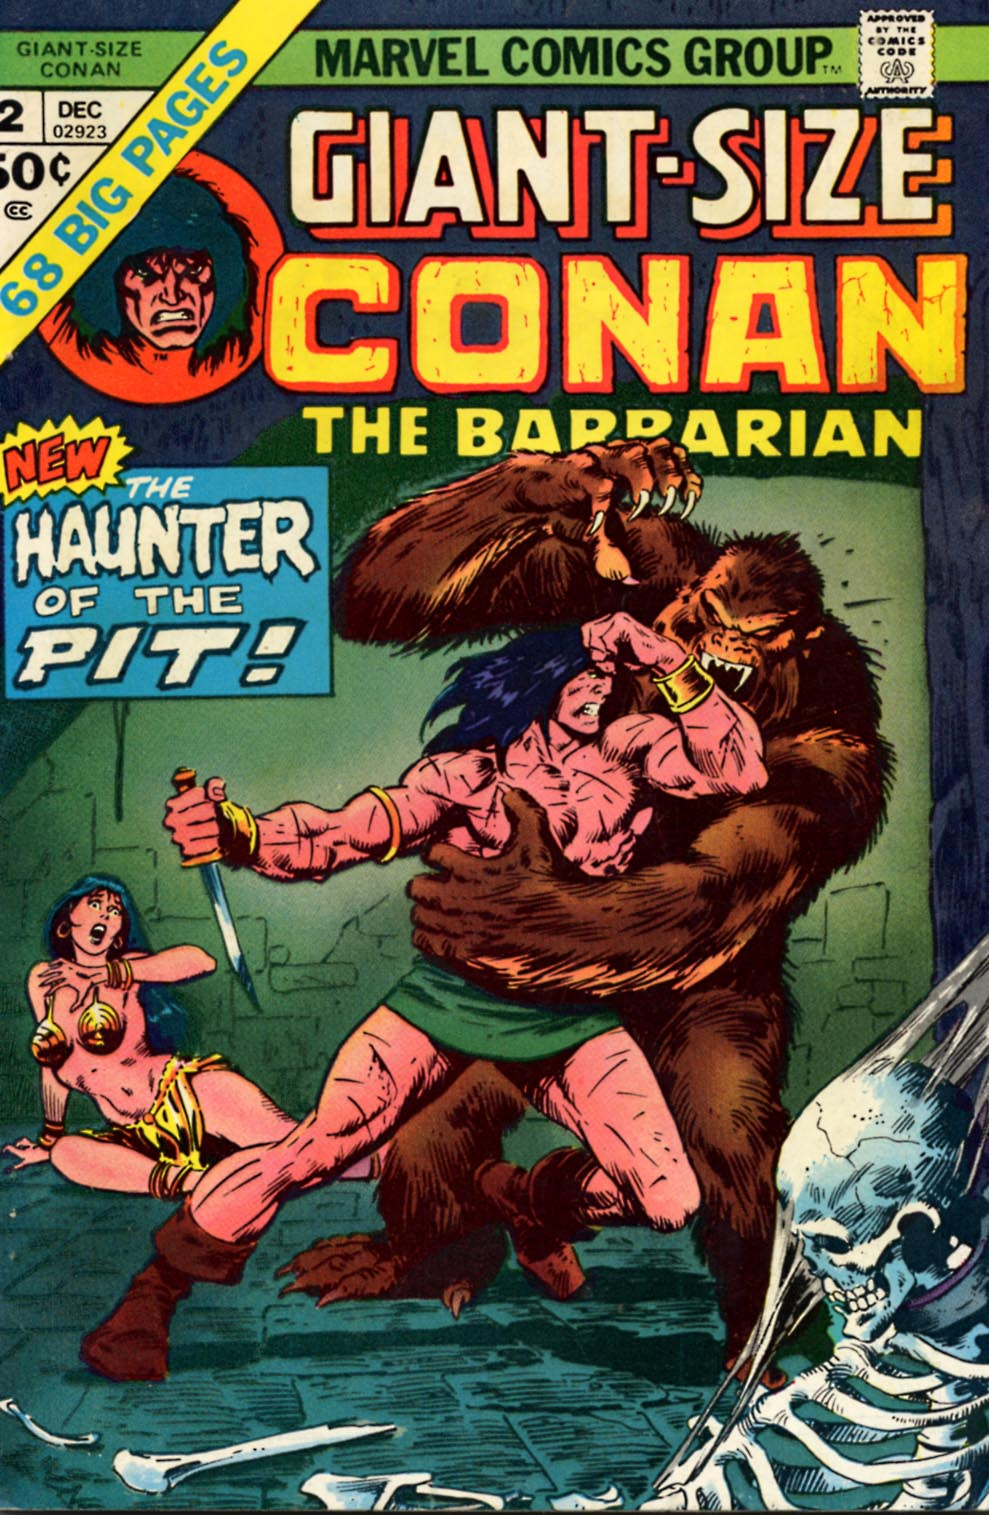 Giant-Size Conan 2